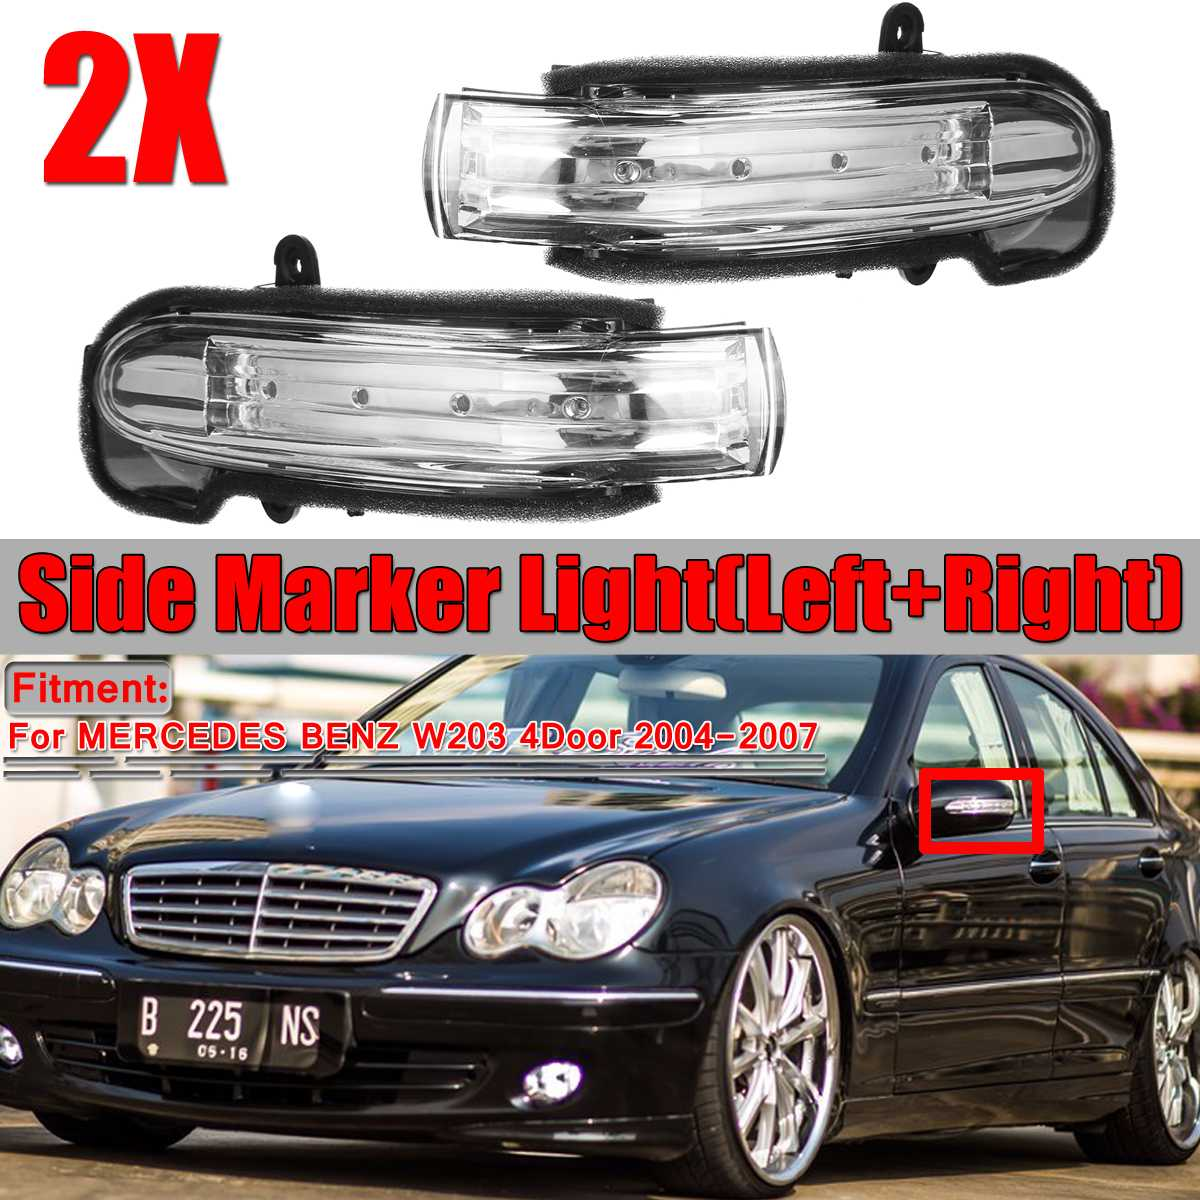 For Mercedes-Benz W211 E320 E500 E55 02-2008 Rear Stop Lamp 3rd Brake Tail Light